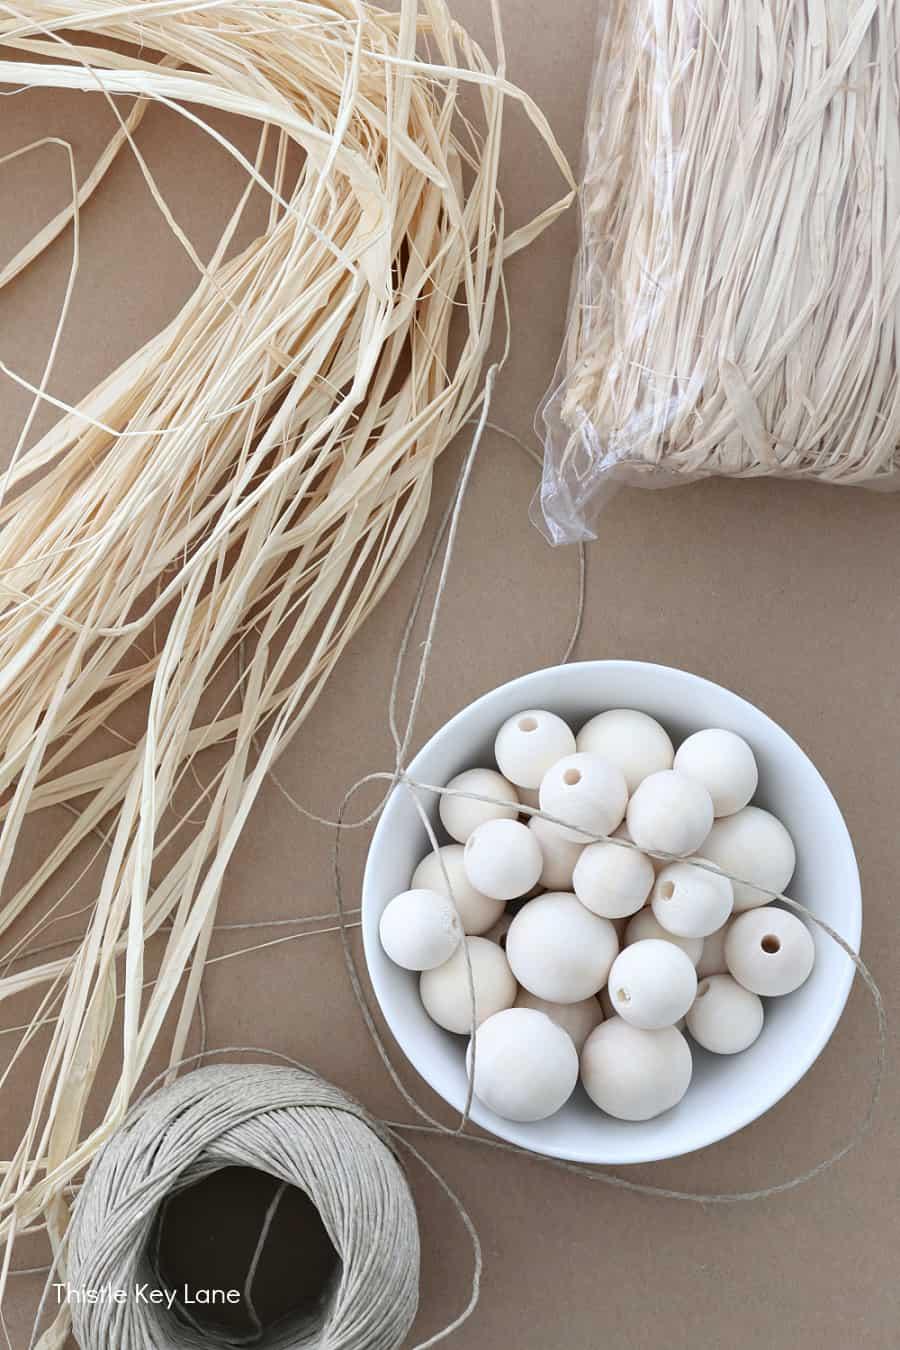 Raffia strands, beads in a bowl and a ball of hemp string. How To Make Raffia Tassels.